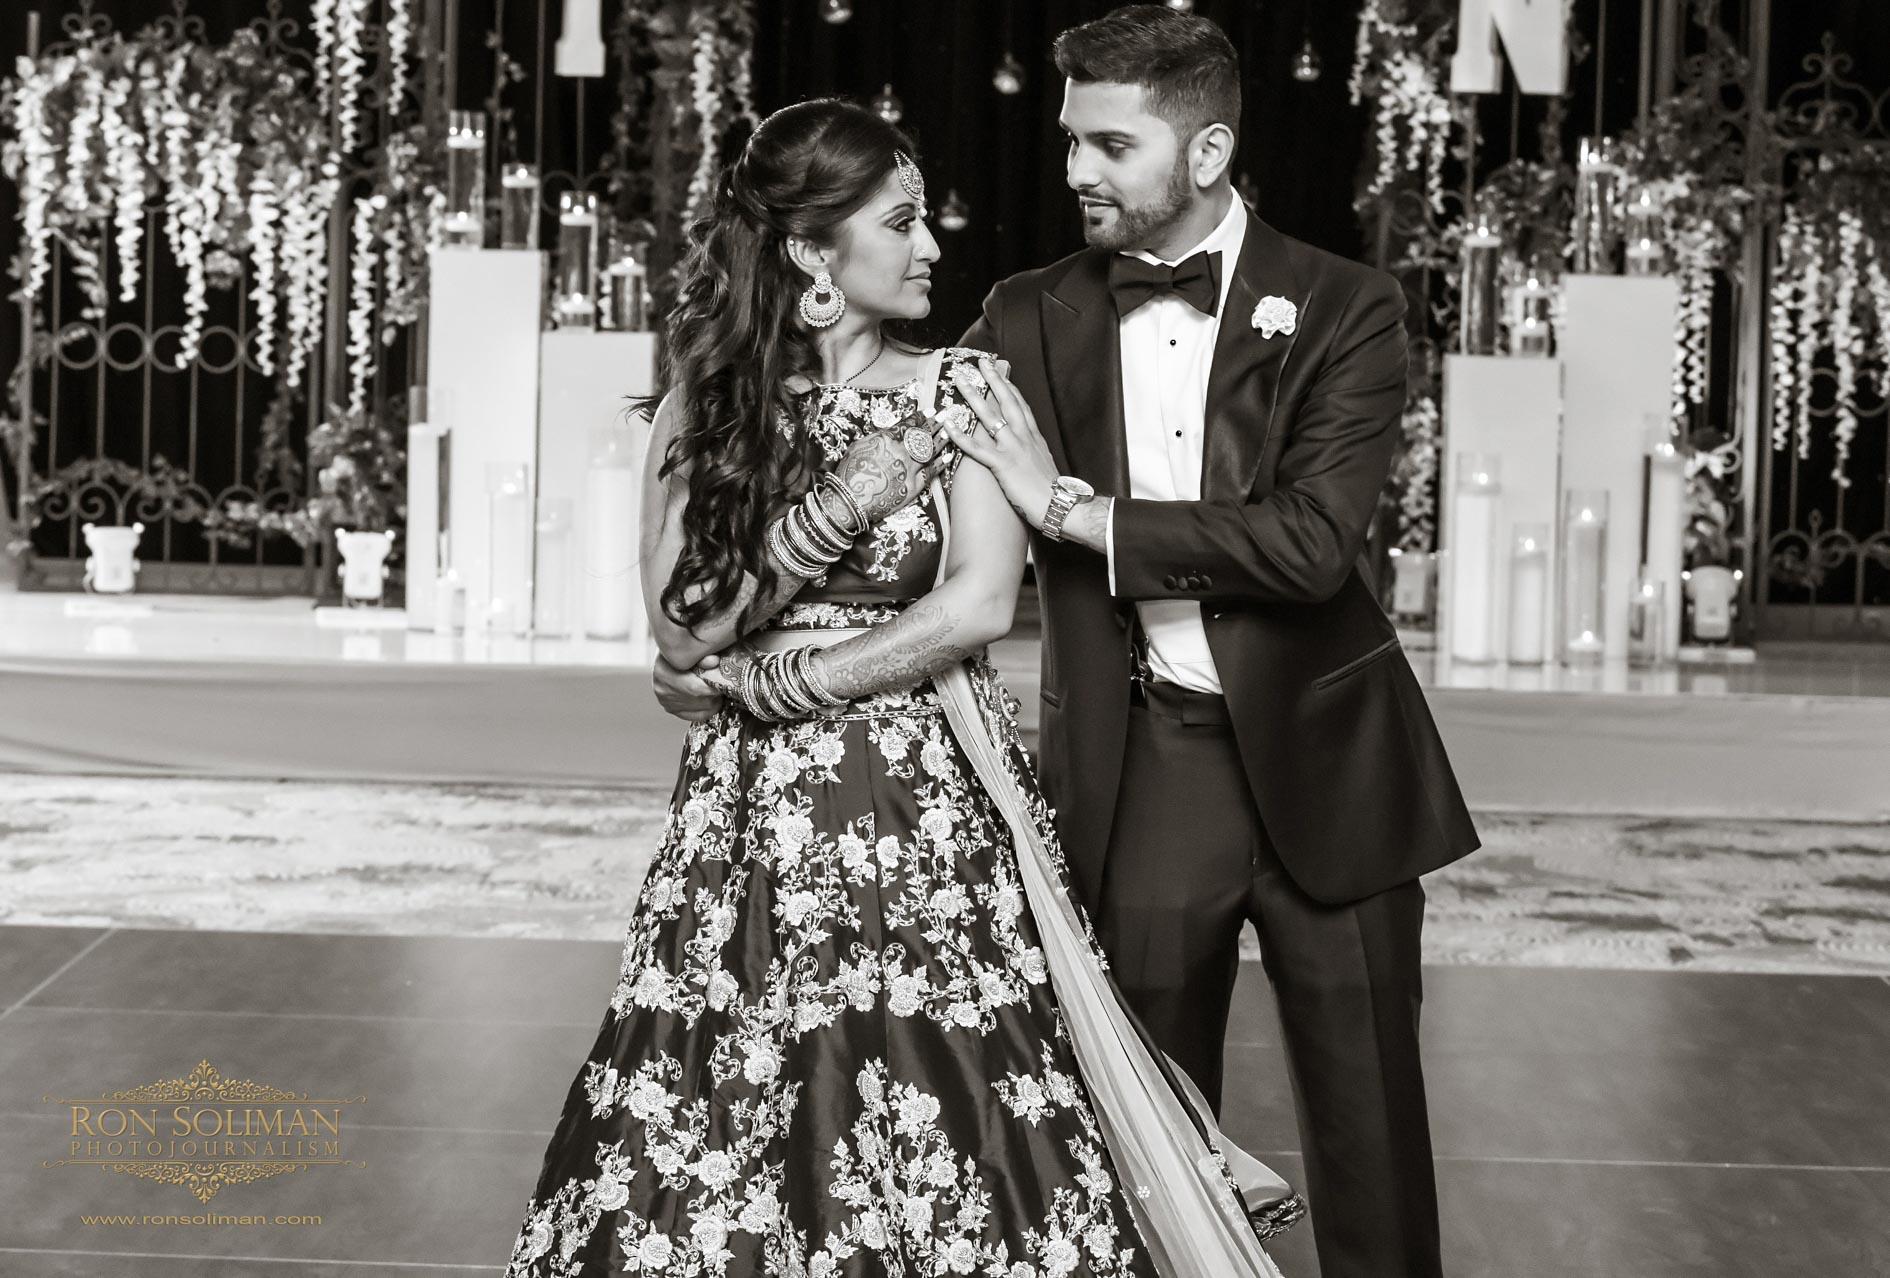 THE MARIGOLD INDIAN WEDDING SOMERSET, NJ